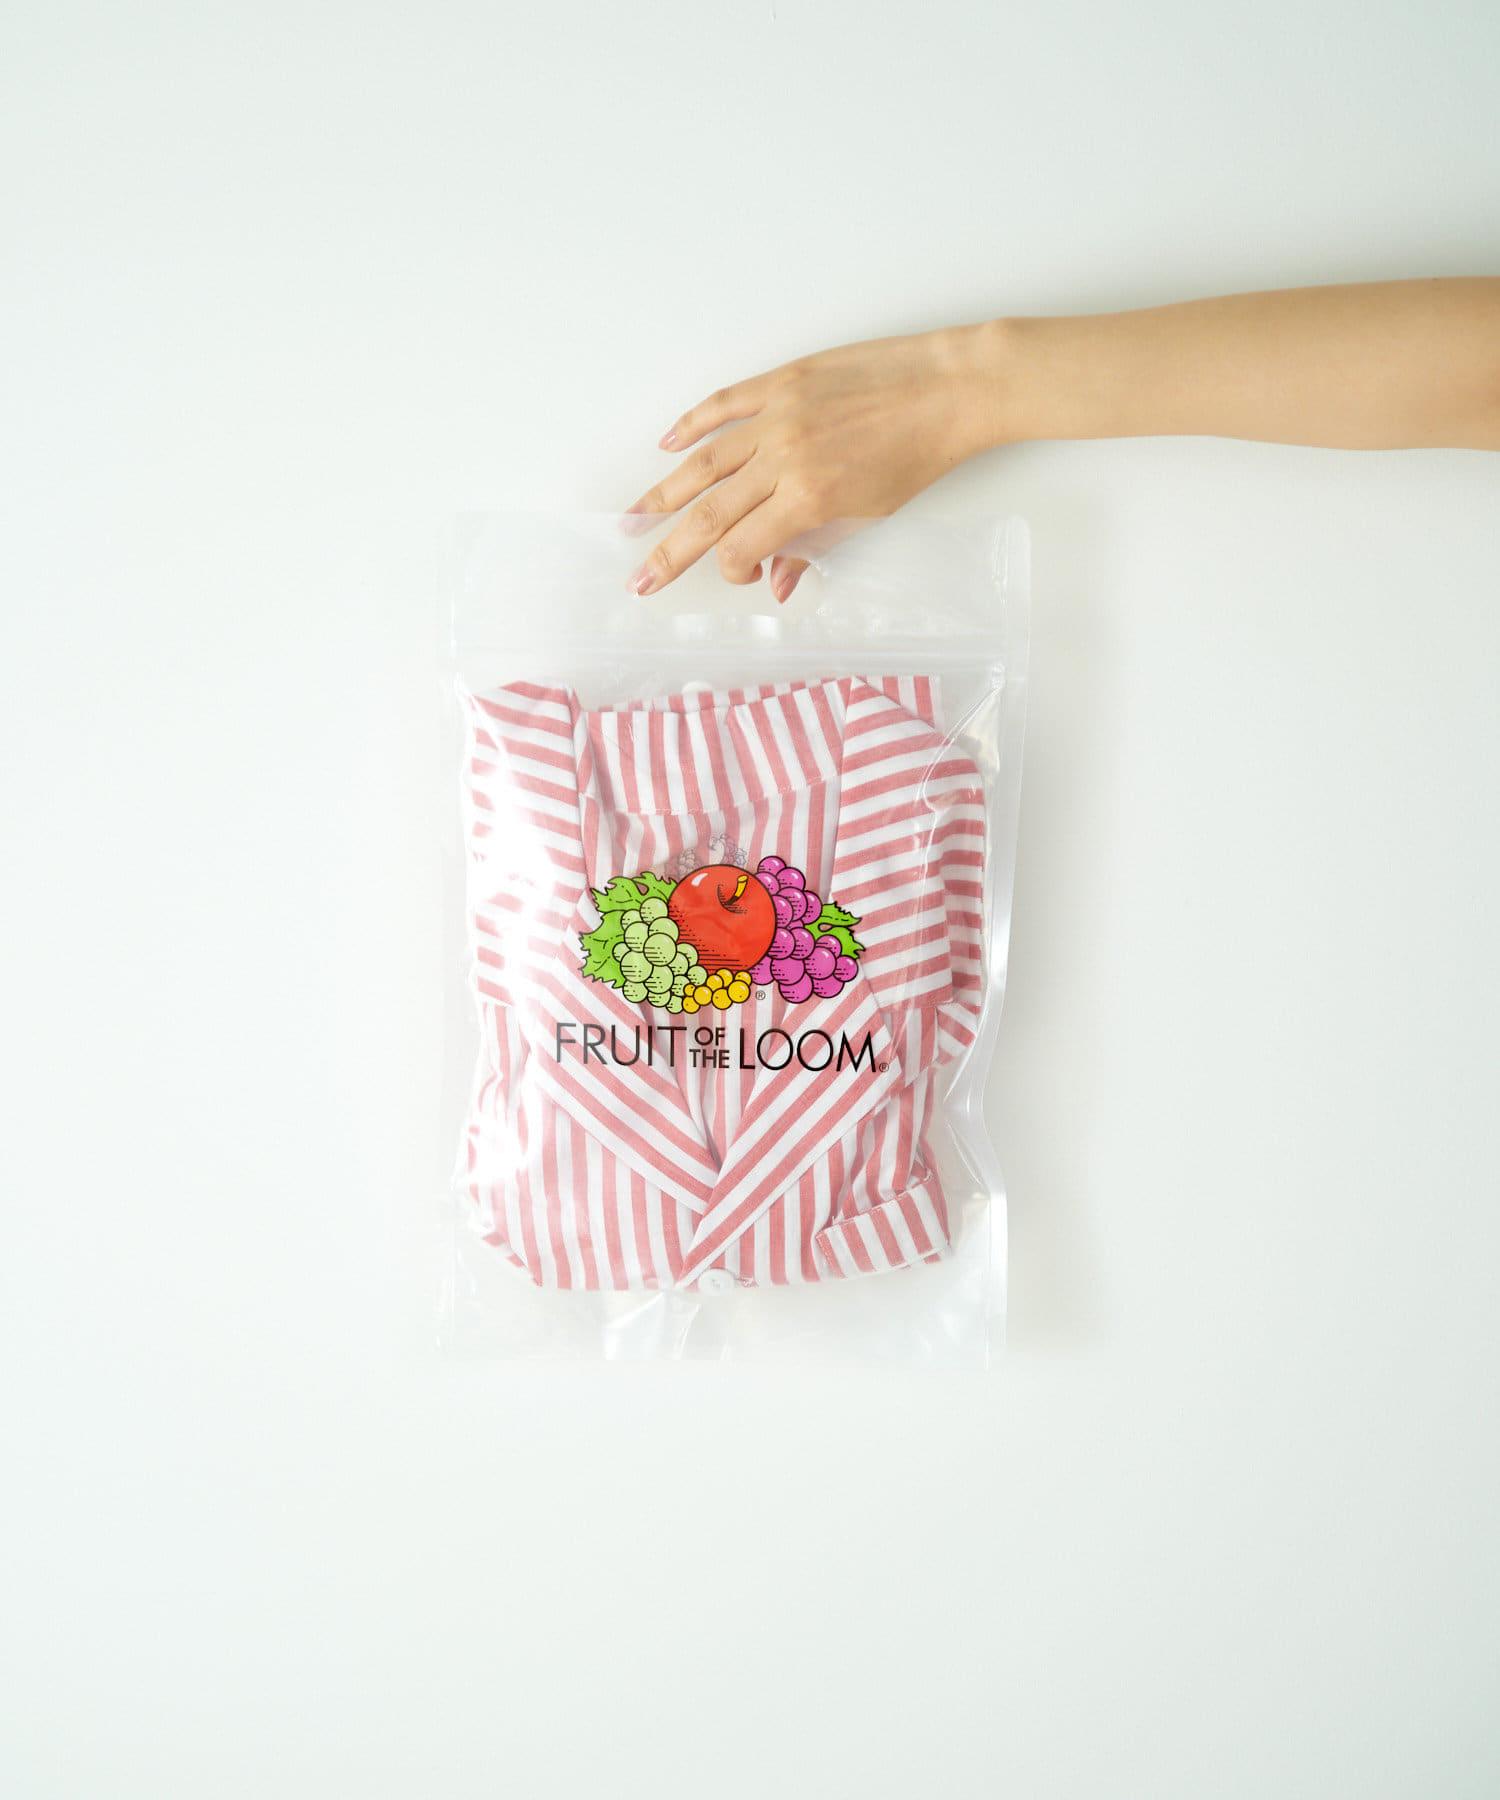 TERRITOIRE(テリトワール) 【FRUIT OF THE LOOM】LADIESリラックスコットンパジャマ半